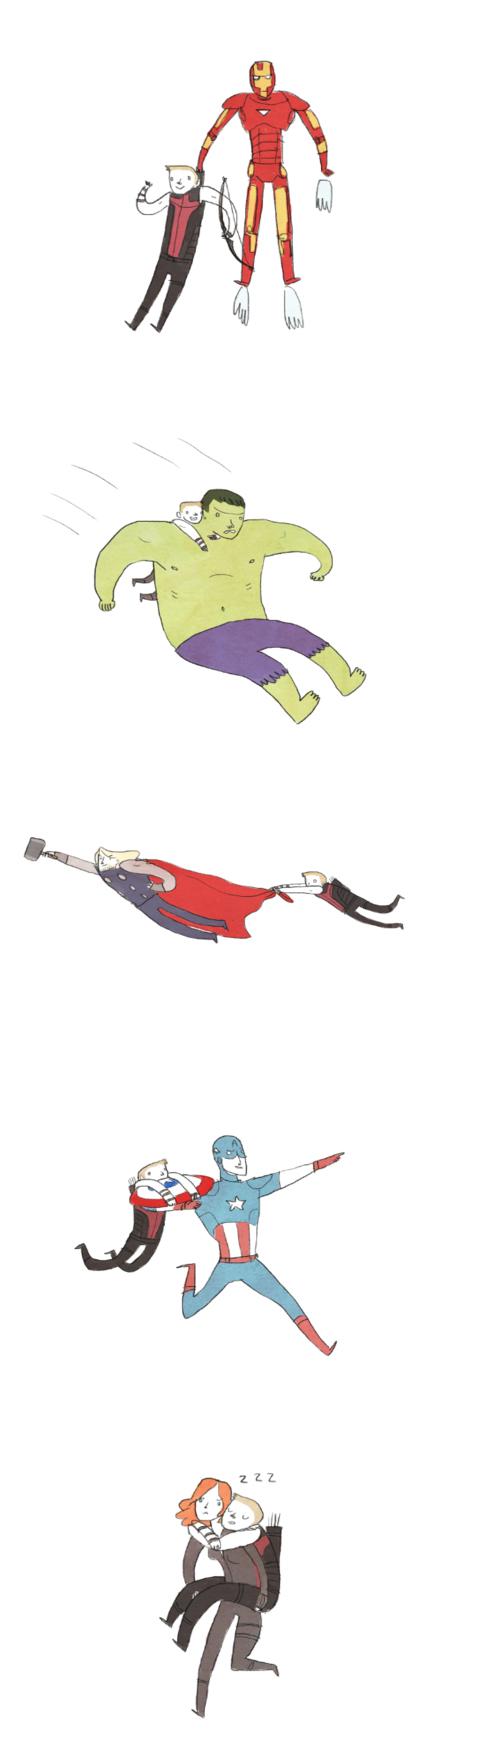 Tags: Anime, Iron Man, The Avengers, Iron Man (Character), Hawkeye (Character), Black Widow, Captain America, Thor Odinson, Hulk, Marvel